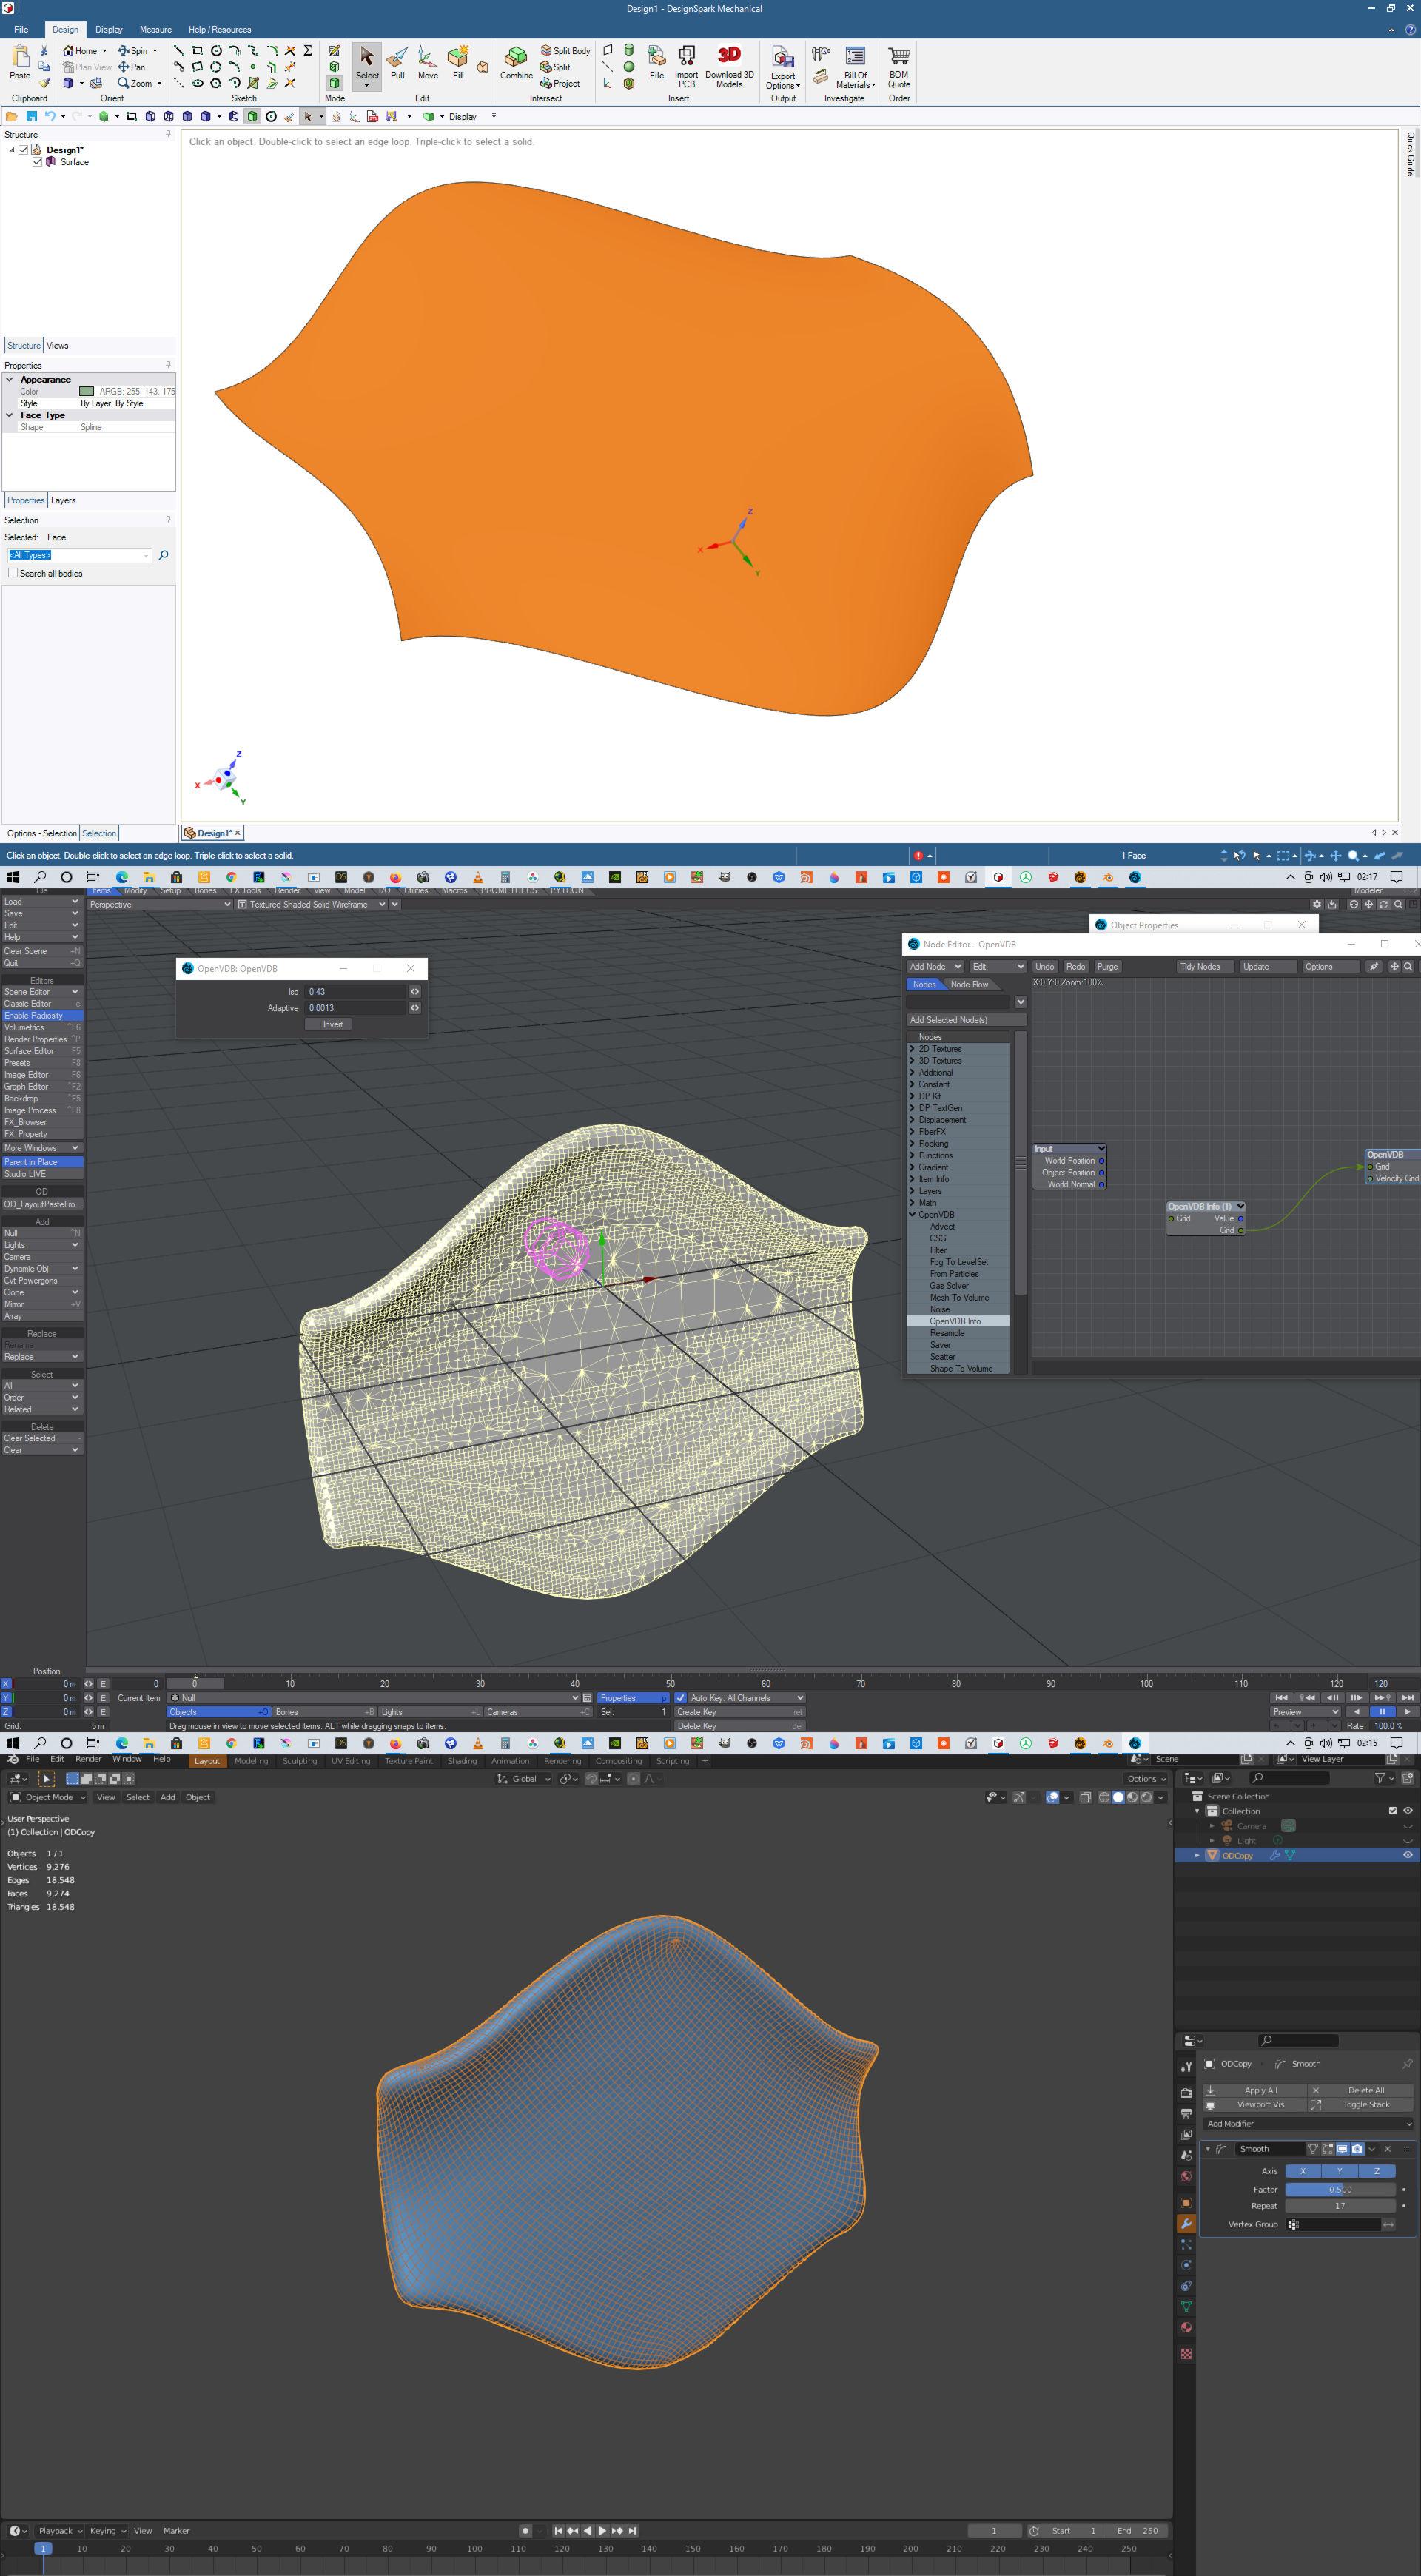 vdb 3 tools refinement.jpg